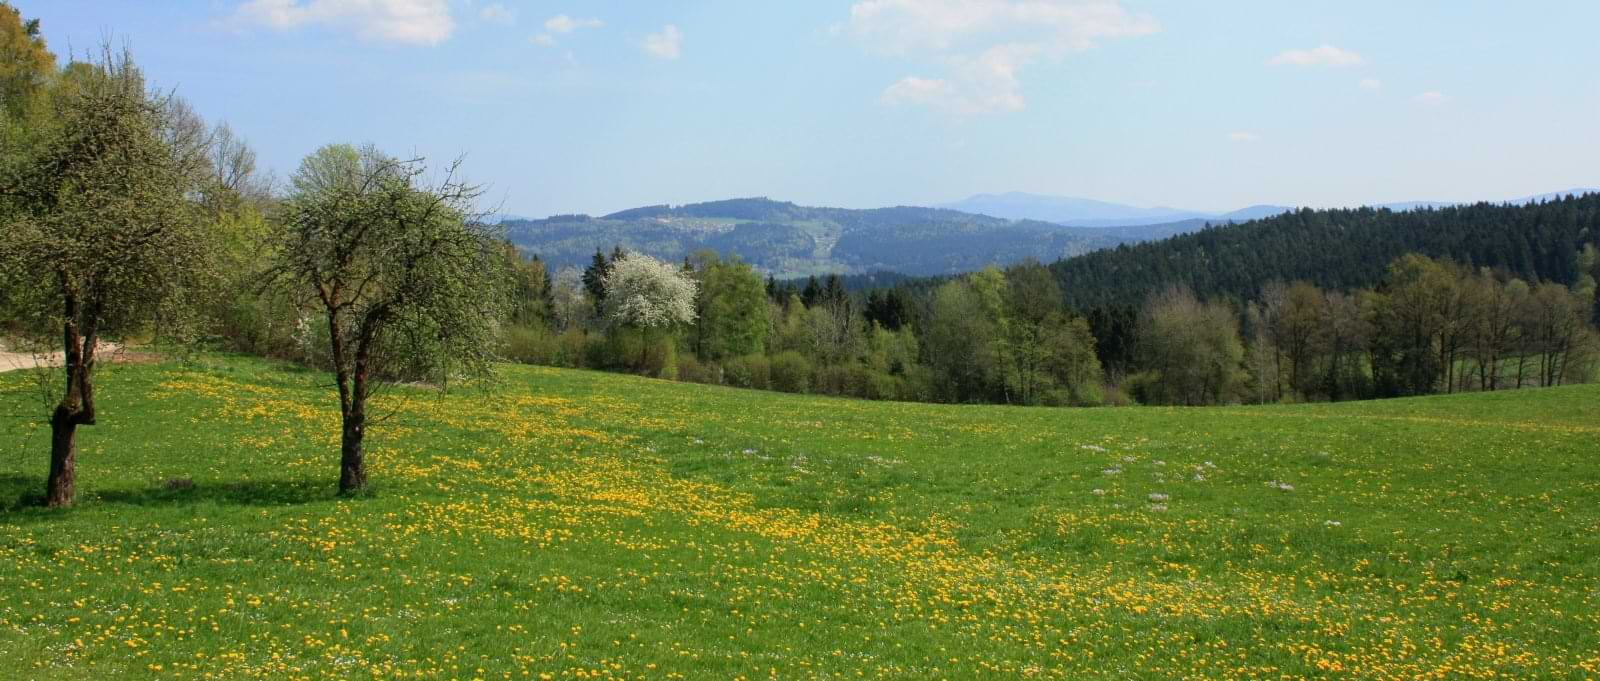 kopp-panorama-bayerischer-wald-urlaub-ferienhaus-ausblick-landschaft-1600